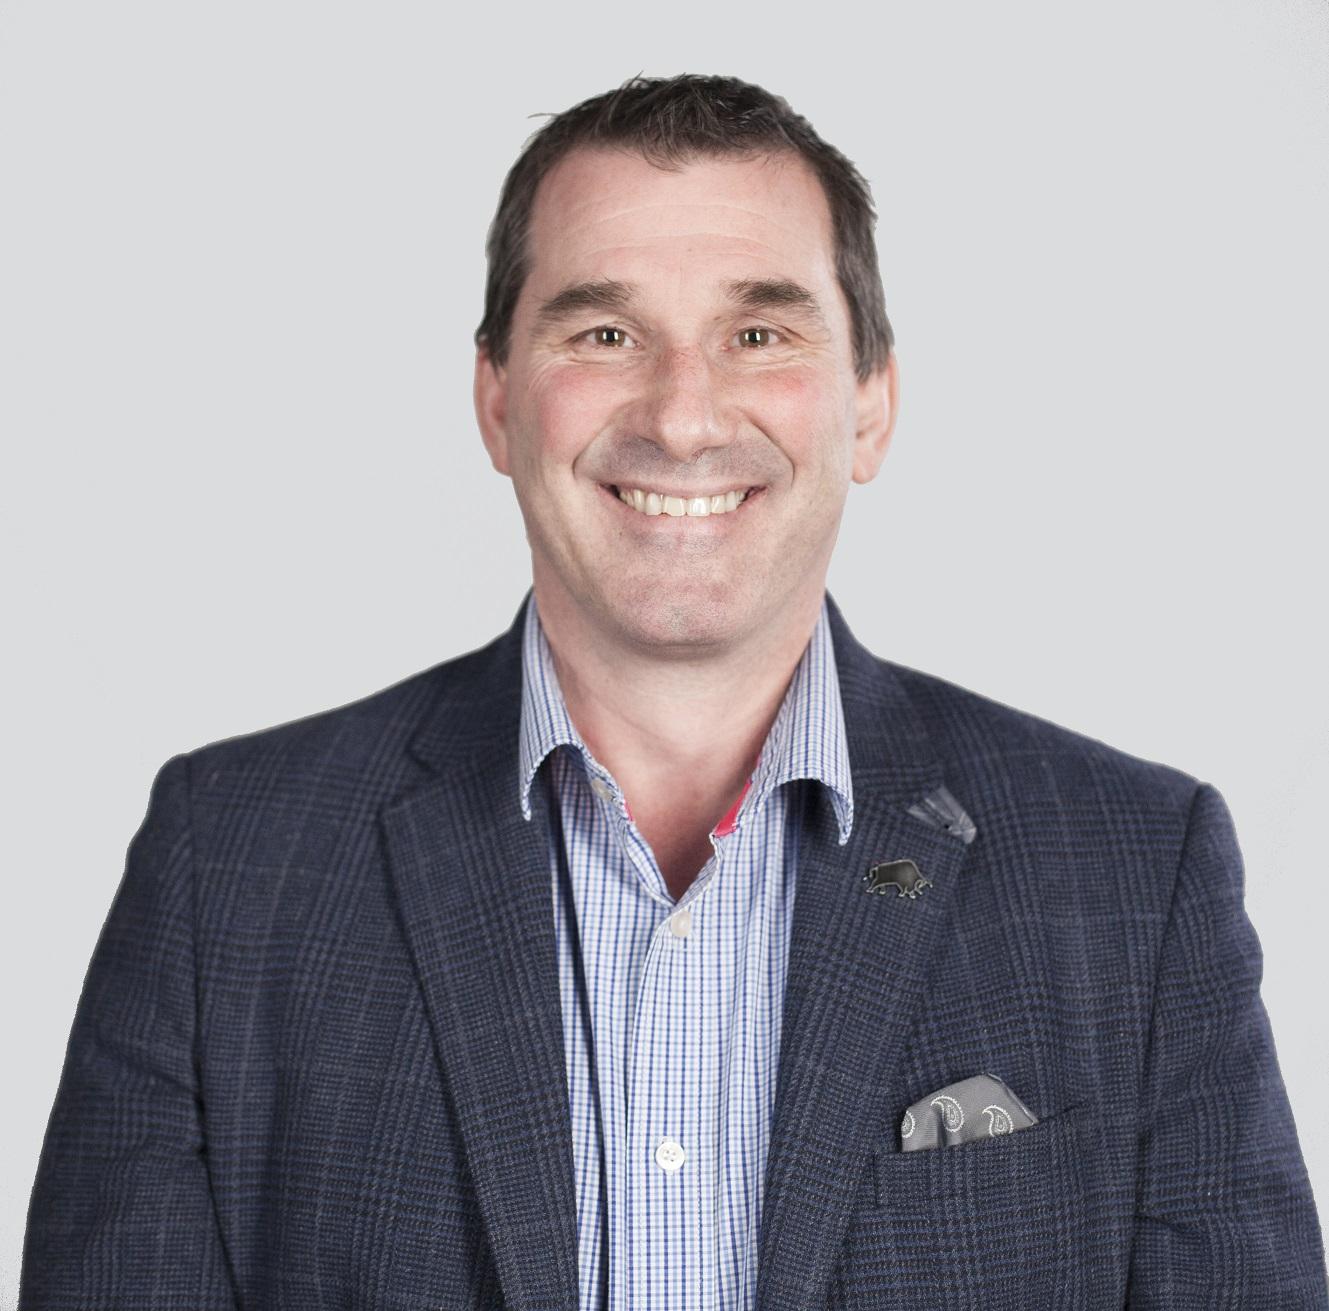 Meet… Gareth Evans